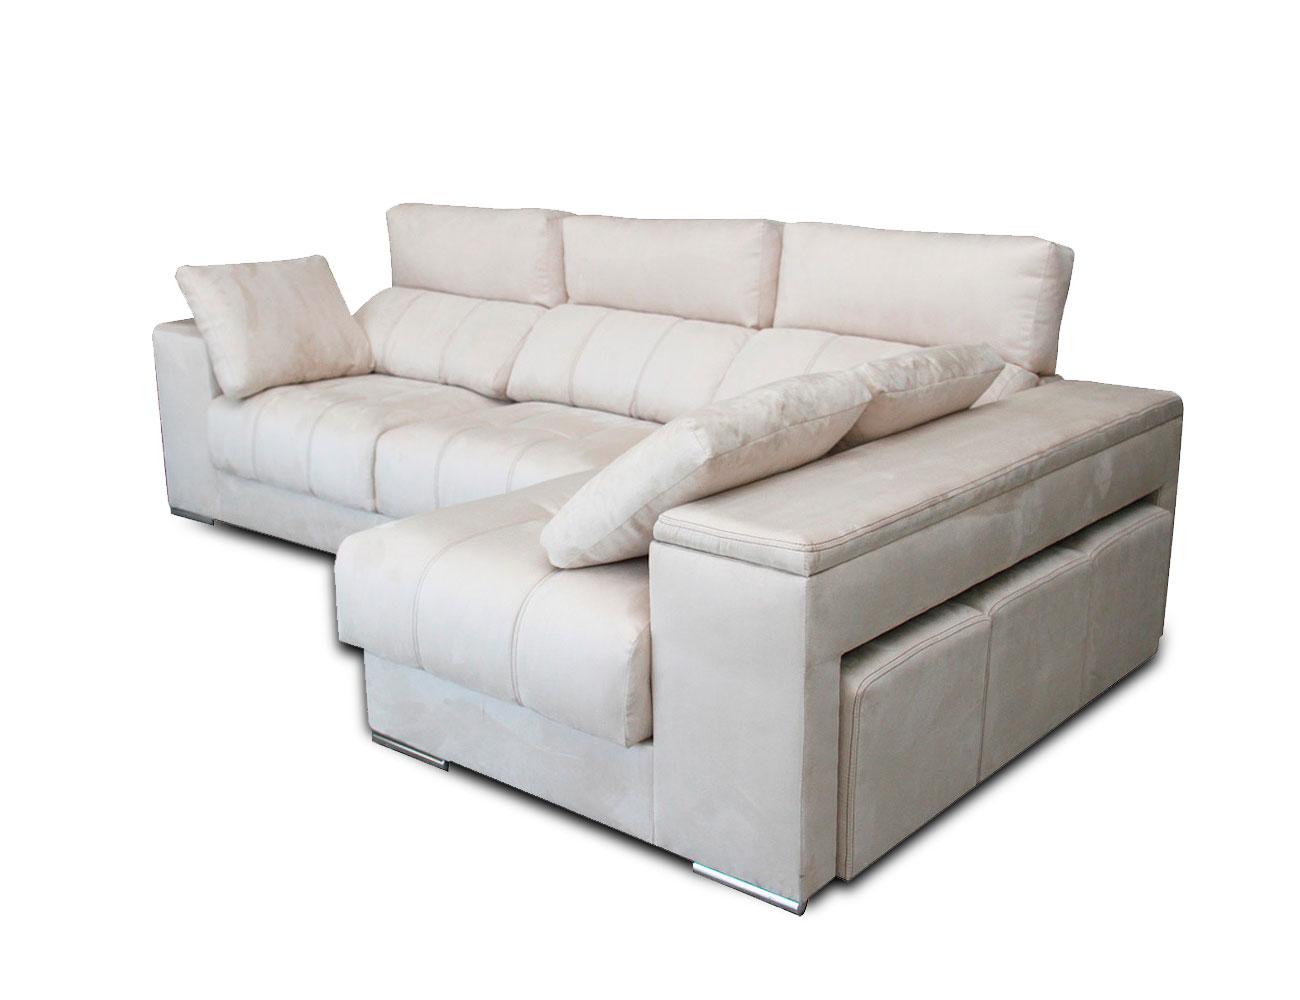 Sofa chaiselongue 3 taburetes arcon 2